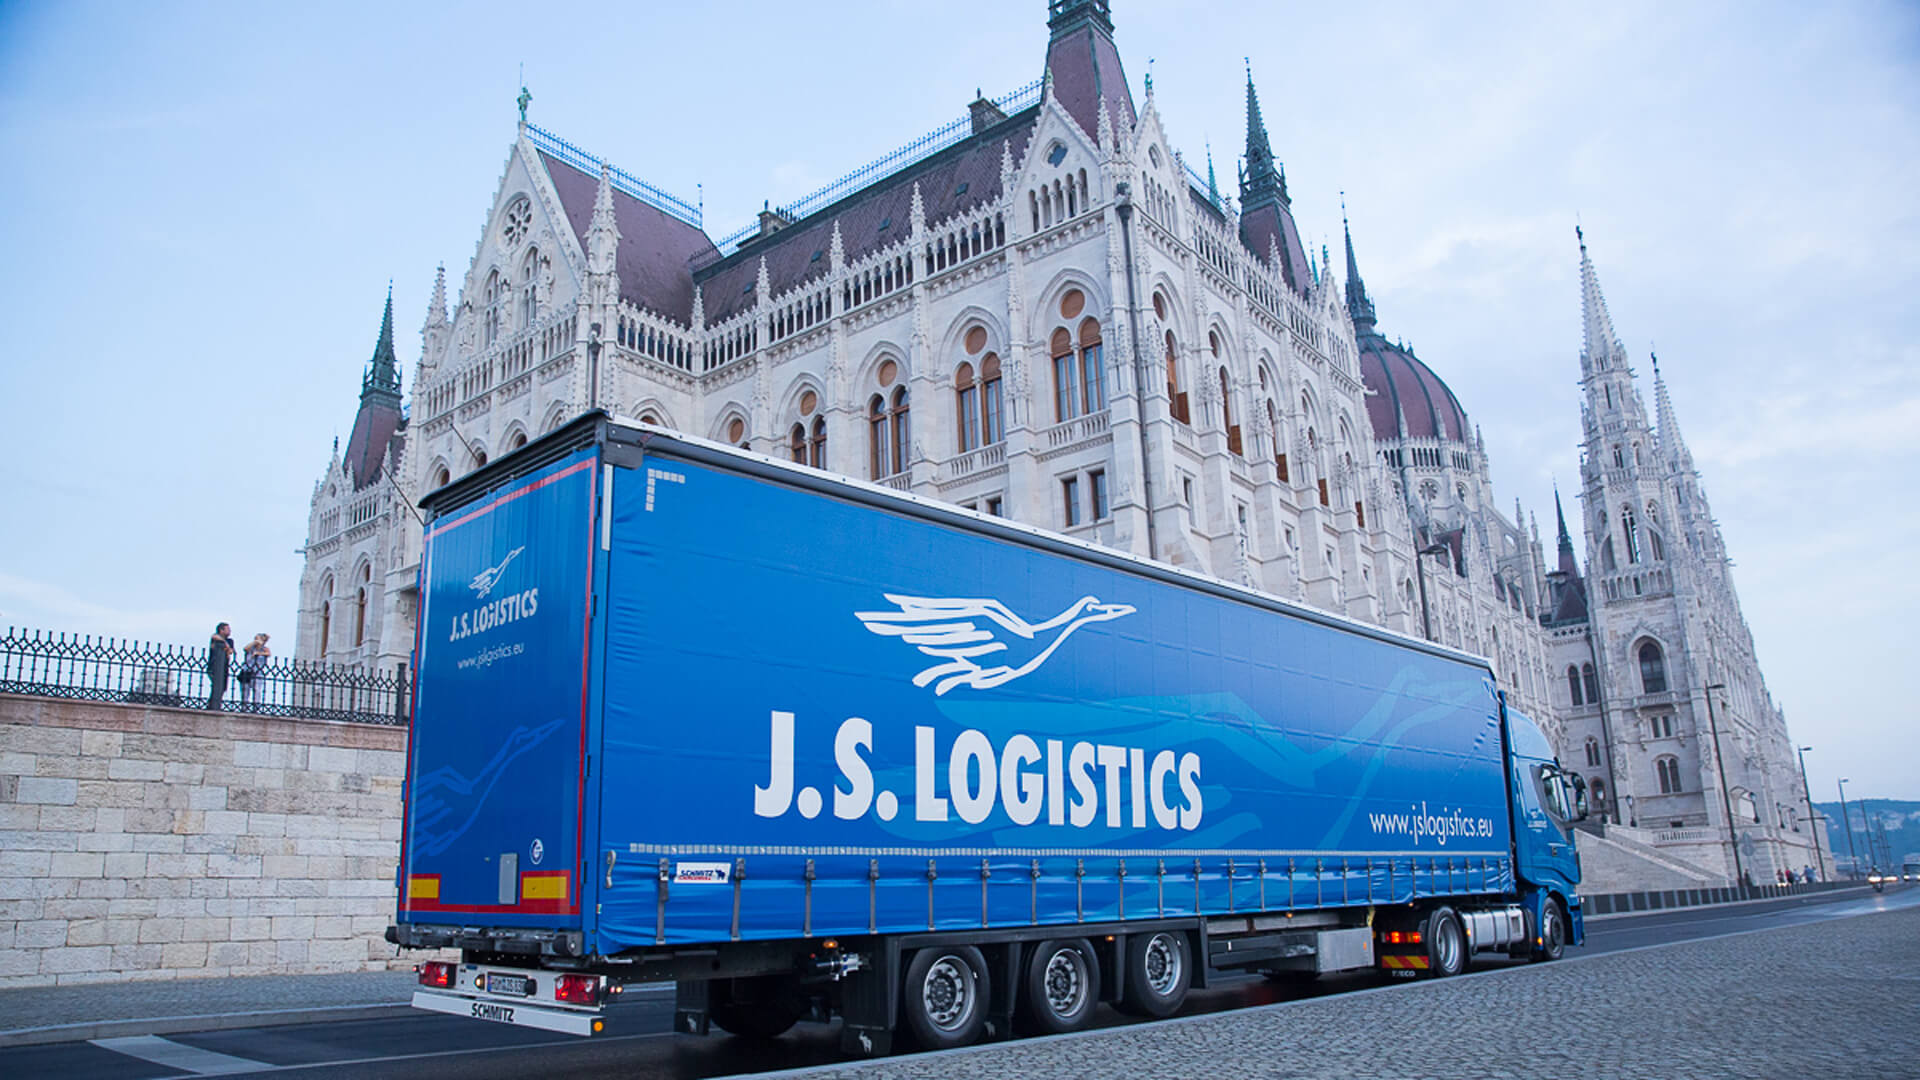 J.S. Logistics page image